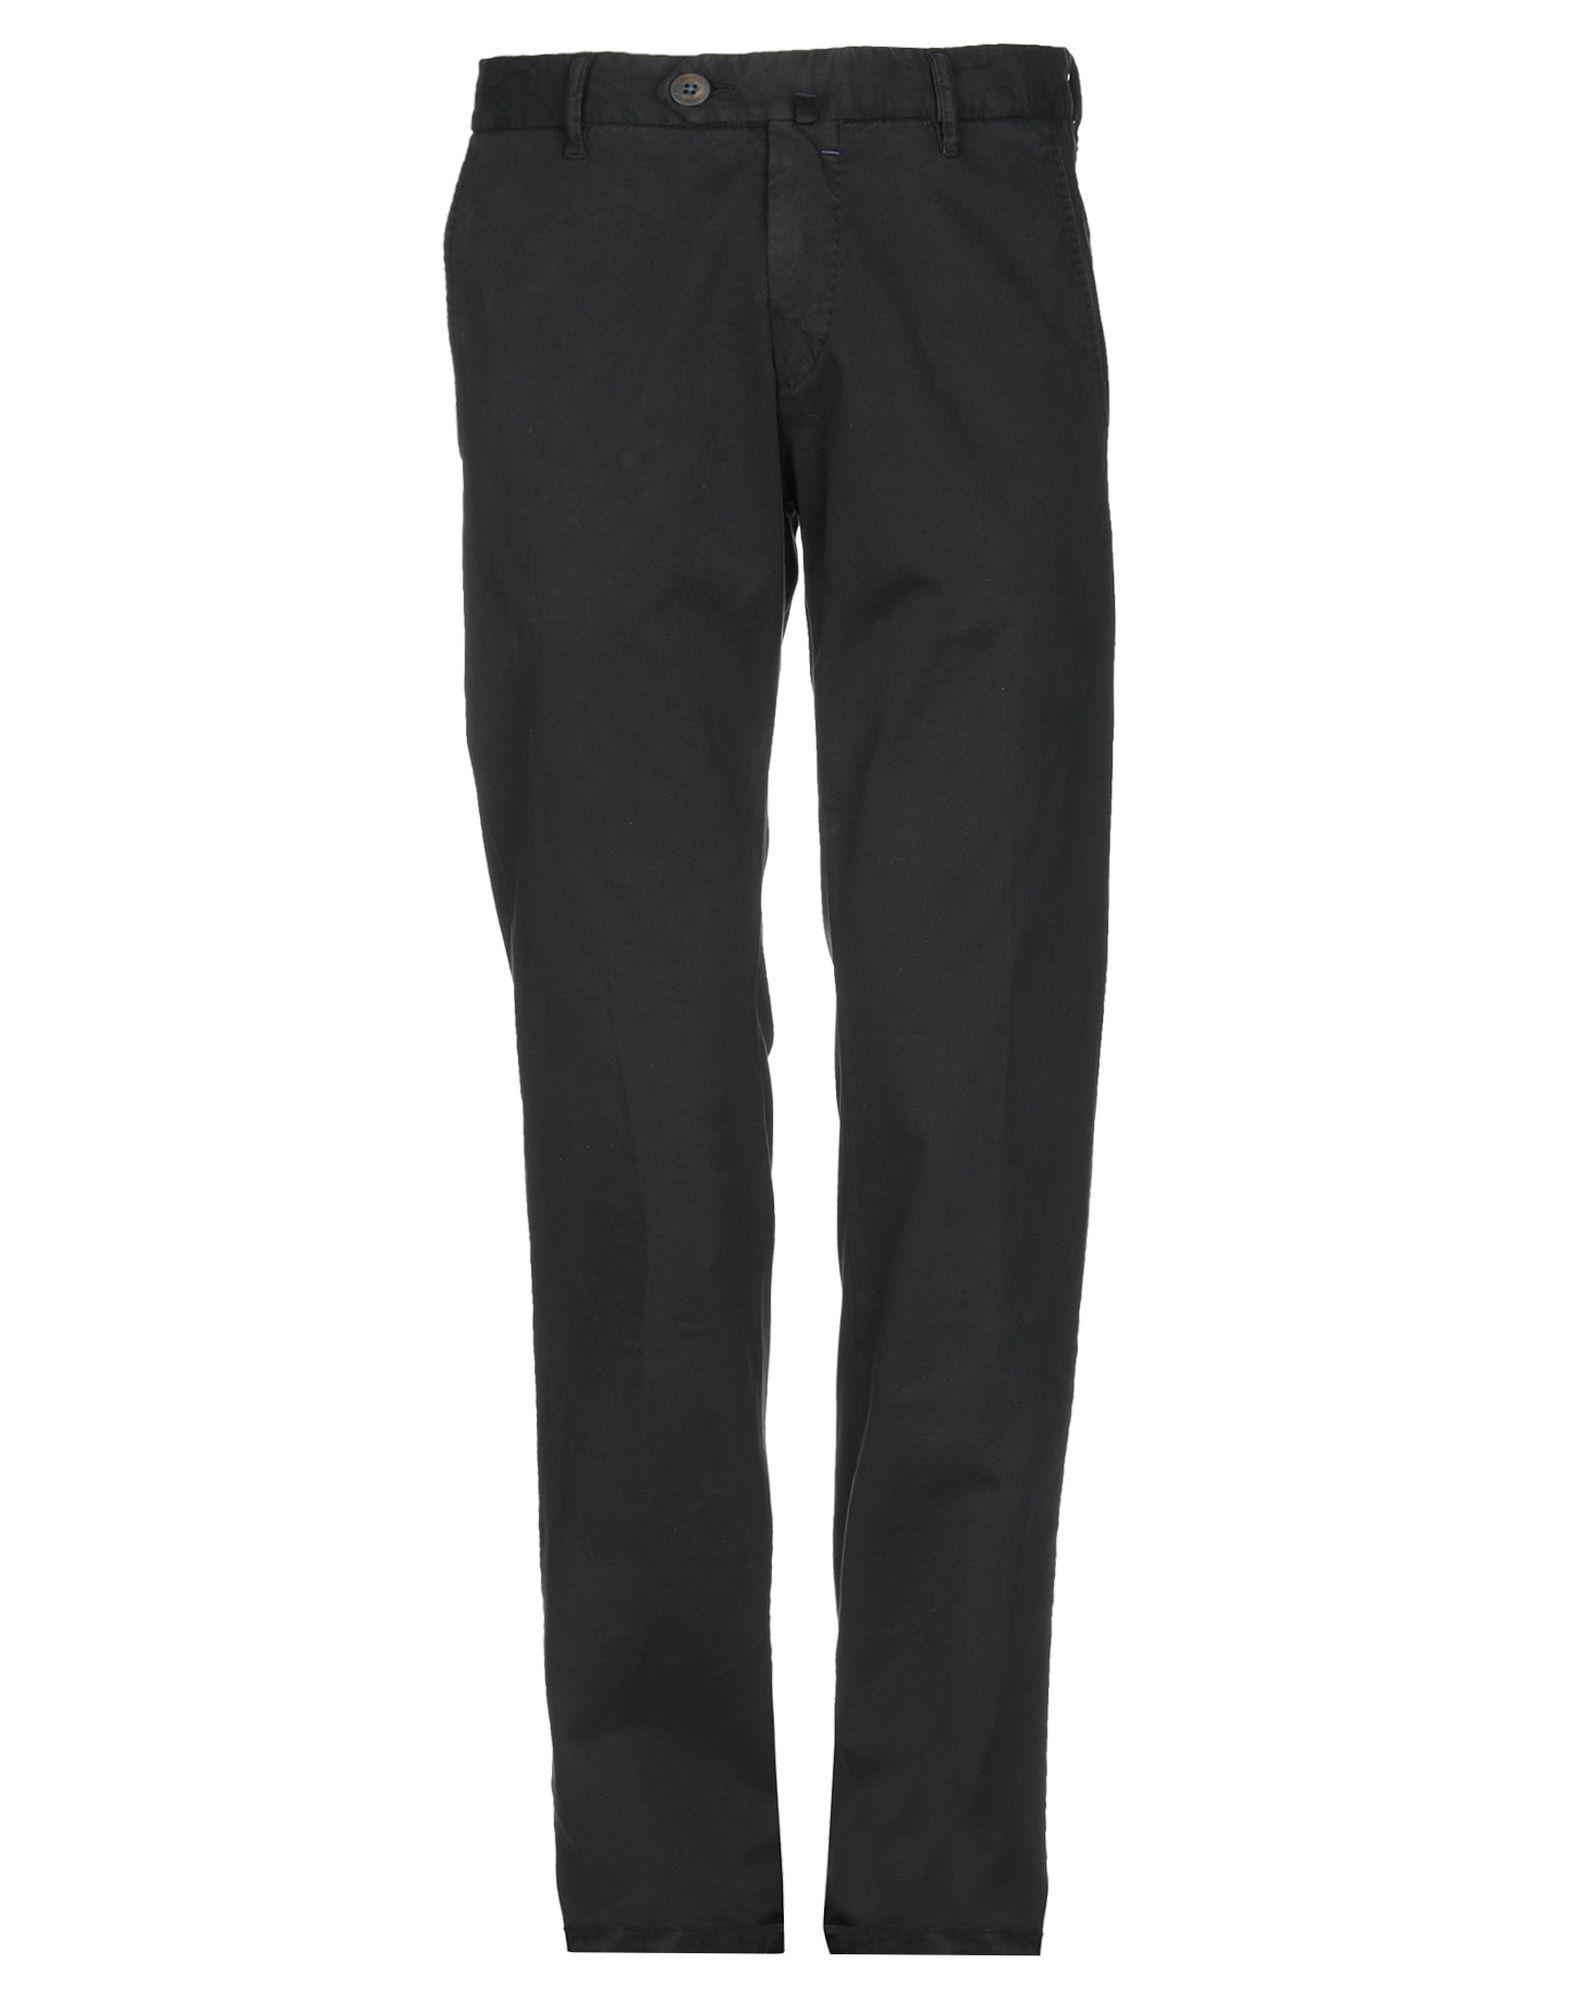 SCAGLIONE CITY Повседневные брюки scaglione city джинсовые брюки